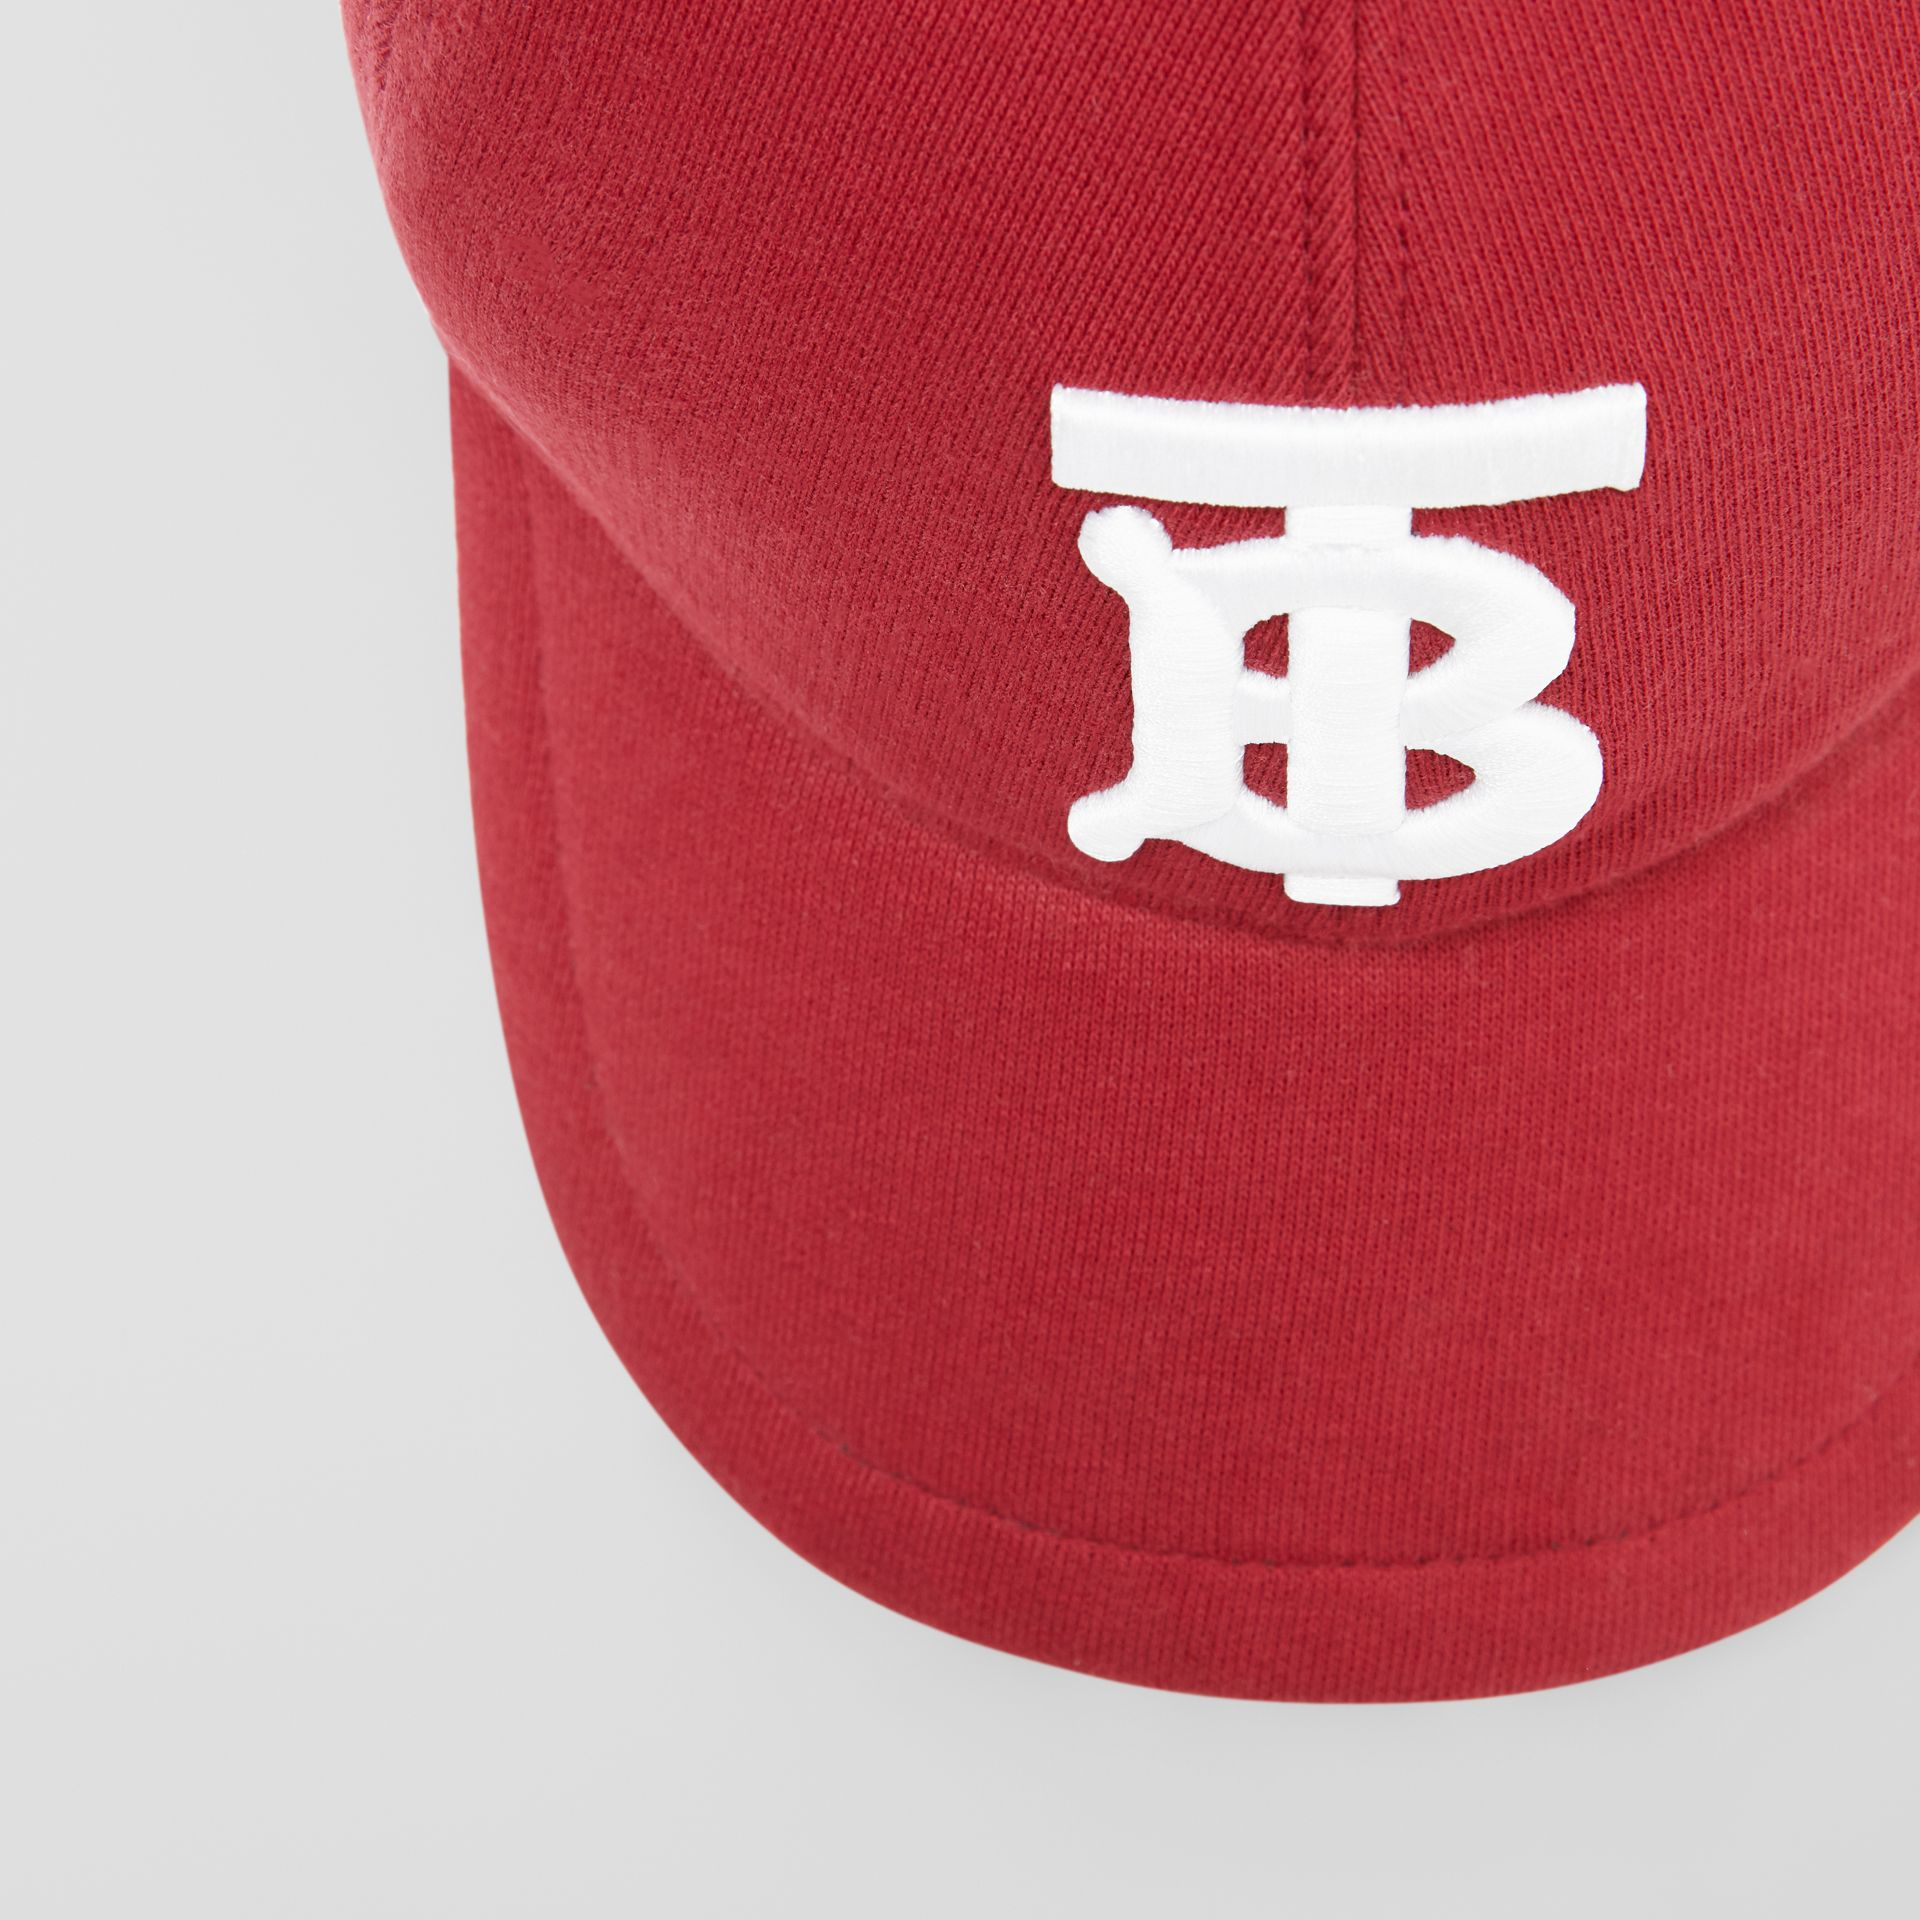 Monogram Motif Jersey Baseball Cap in Dark Carmine | Burberry - gallery image 1